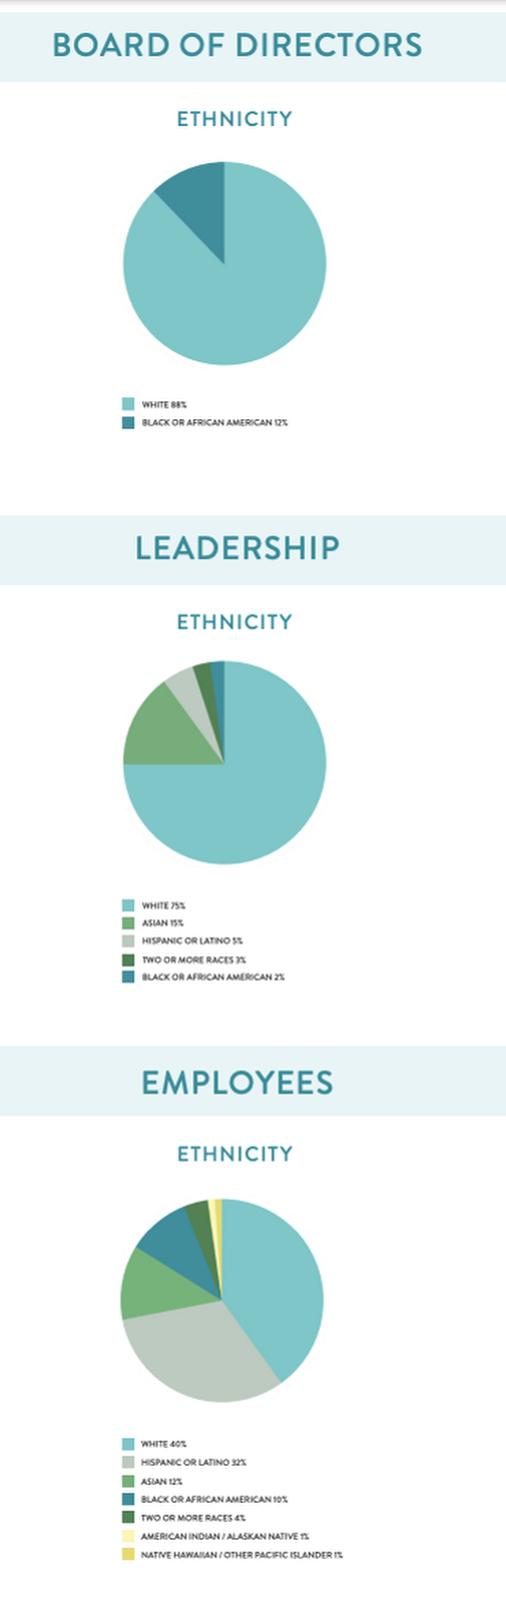 Capri's ethnicity statistics.